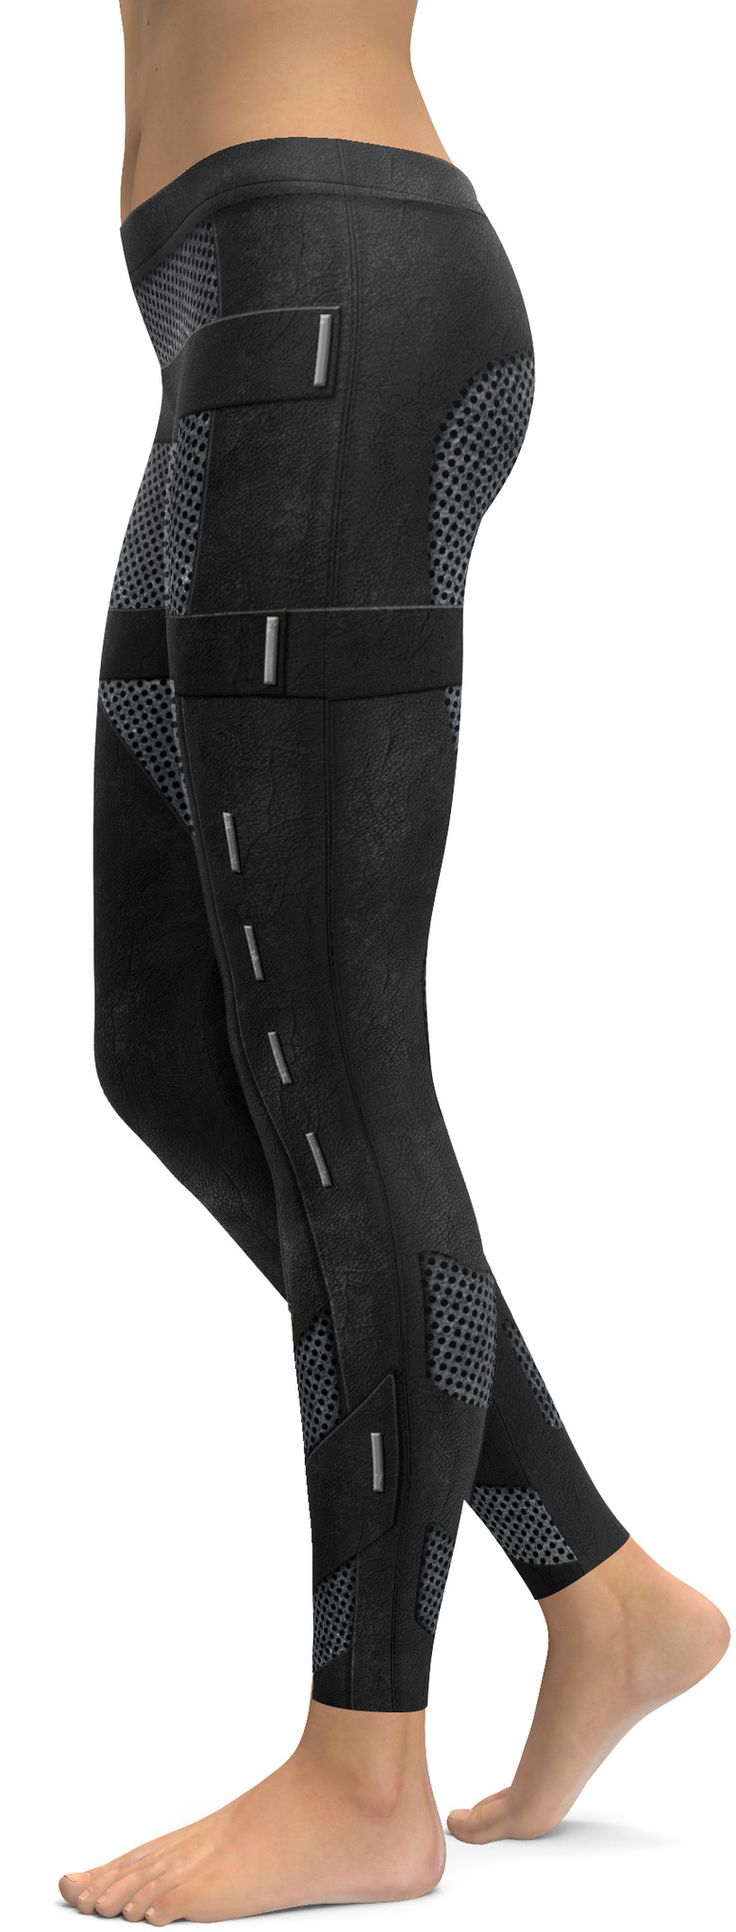 Stealth Leather Armor Leggings